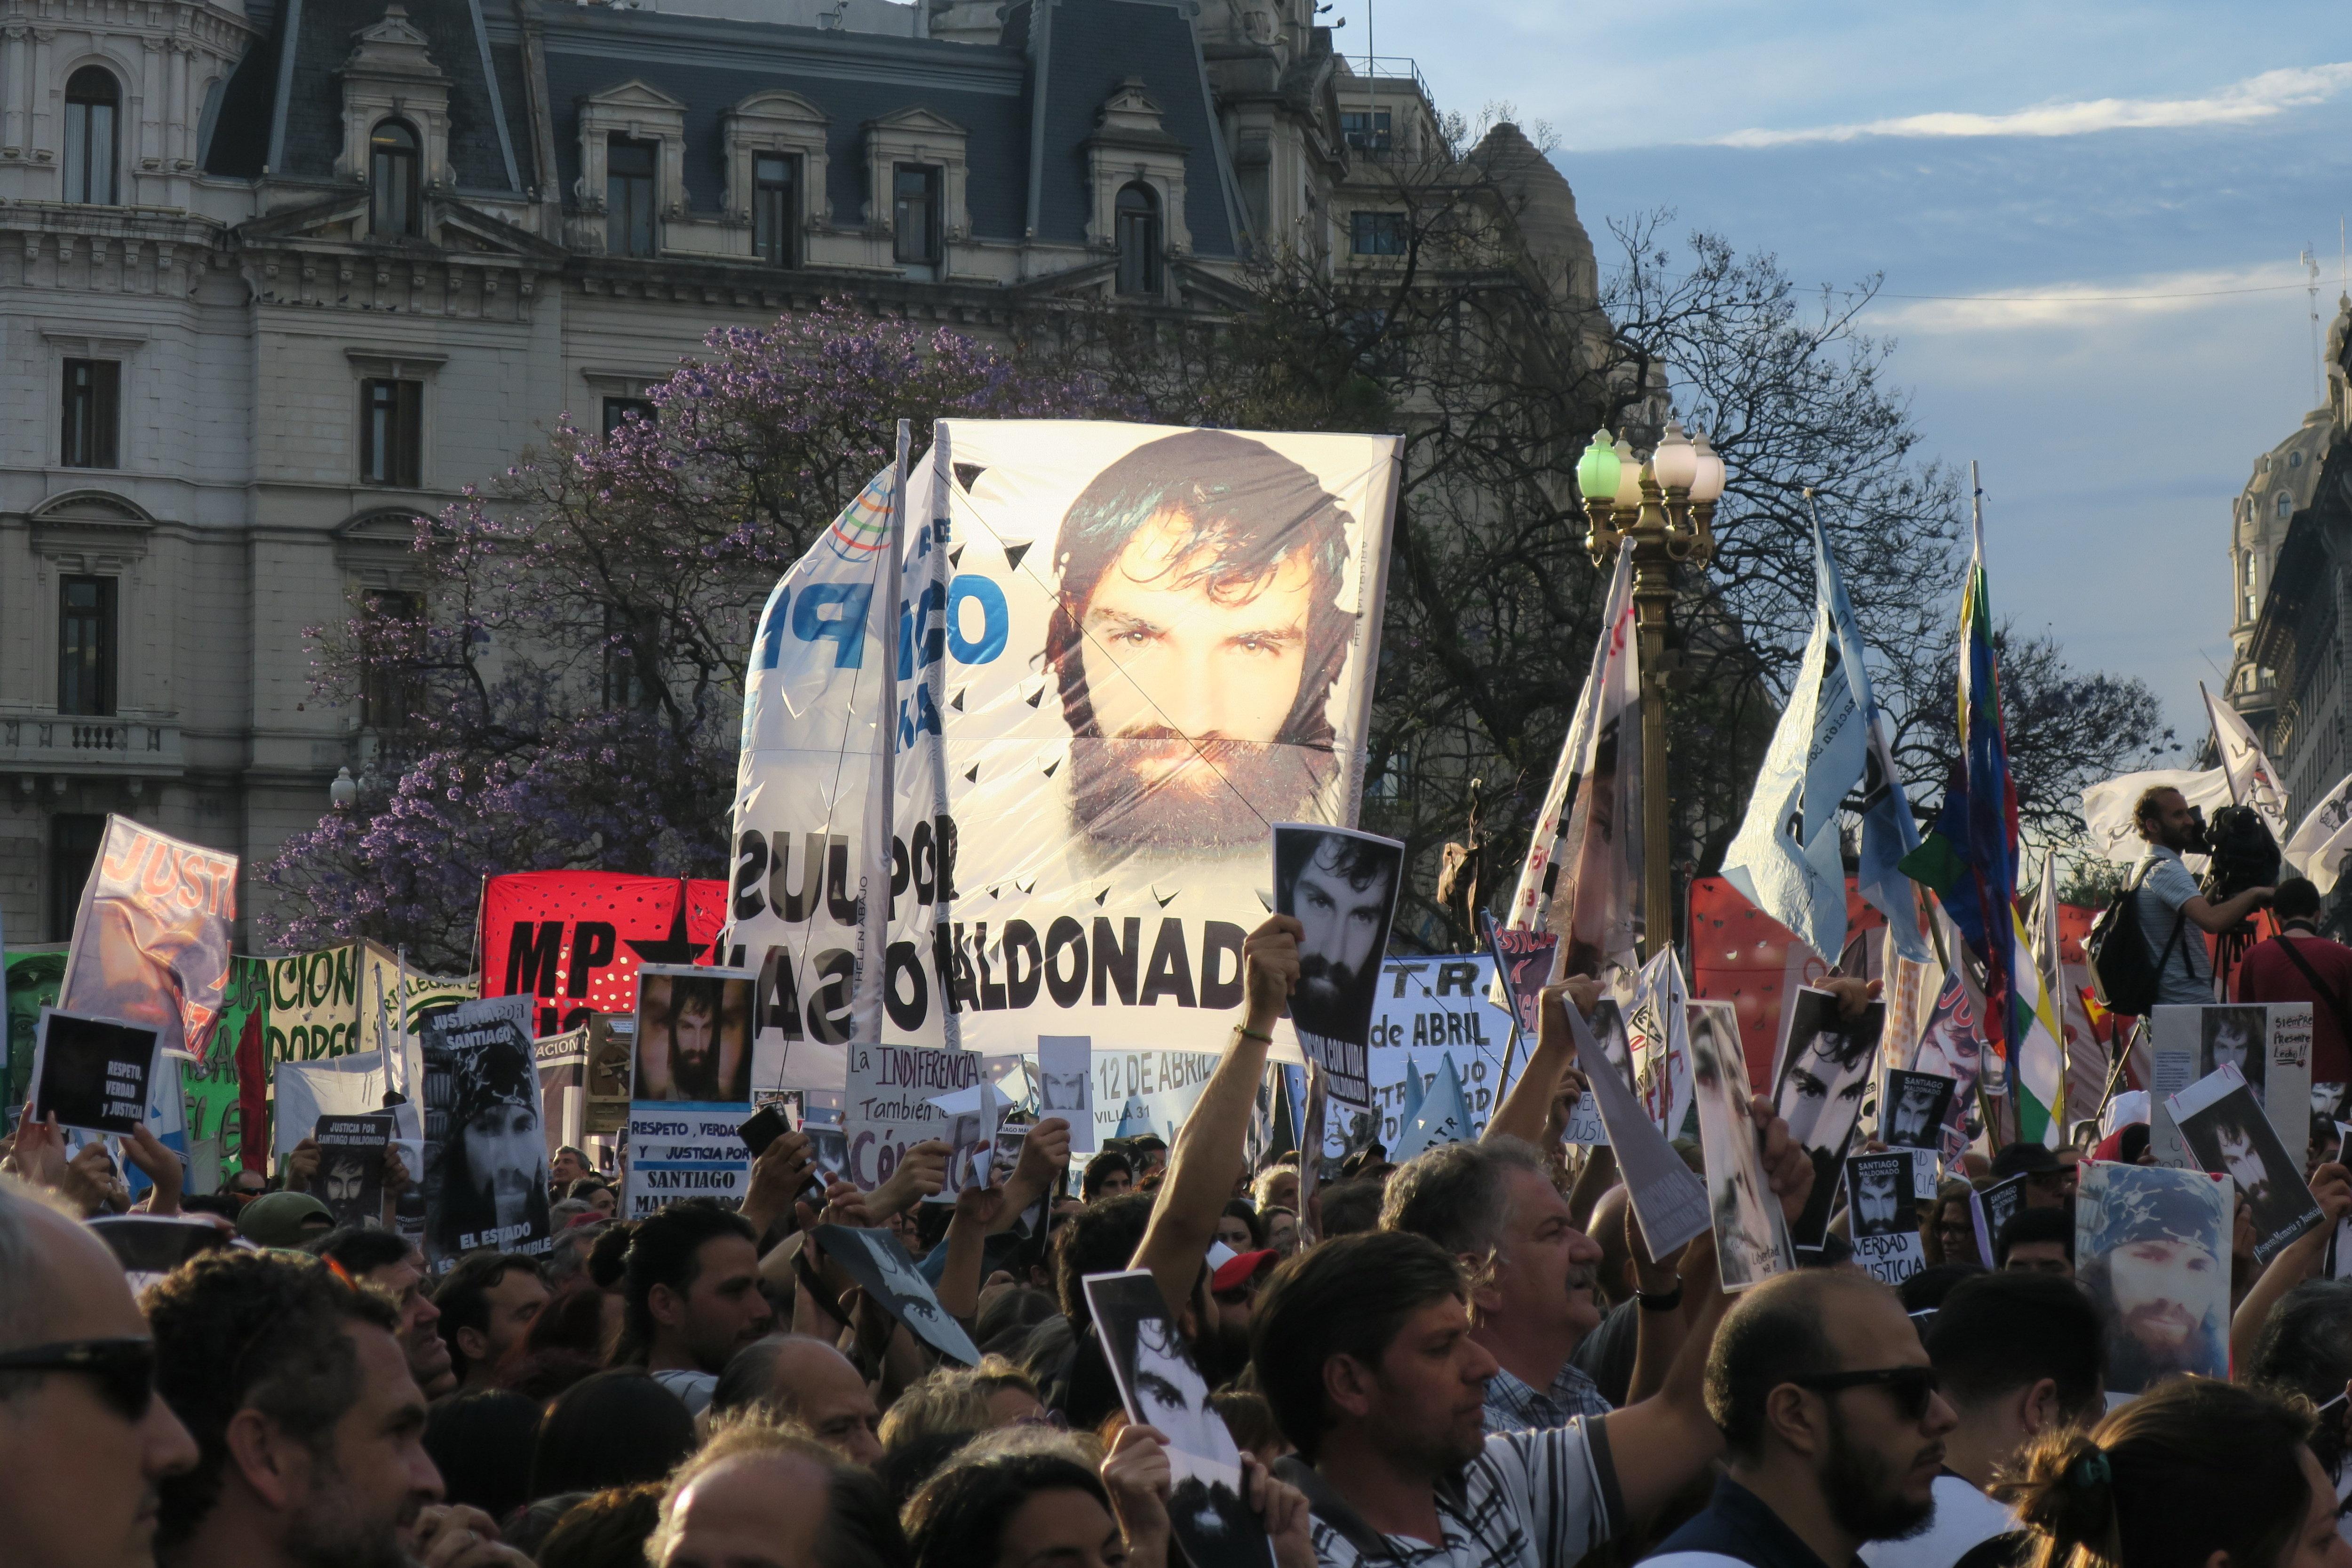 Manifestació per demanar justícia per la mort de Santiago Maldonado, a Buenos Aires (Argentina). /JAVIER CAAMAÑO